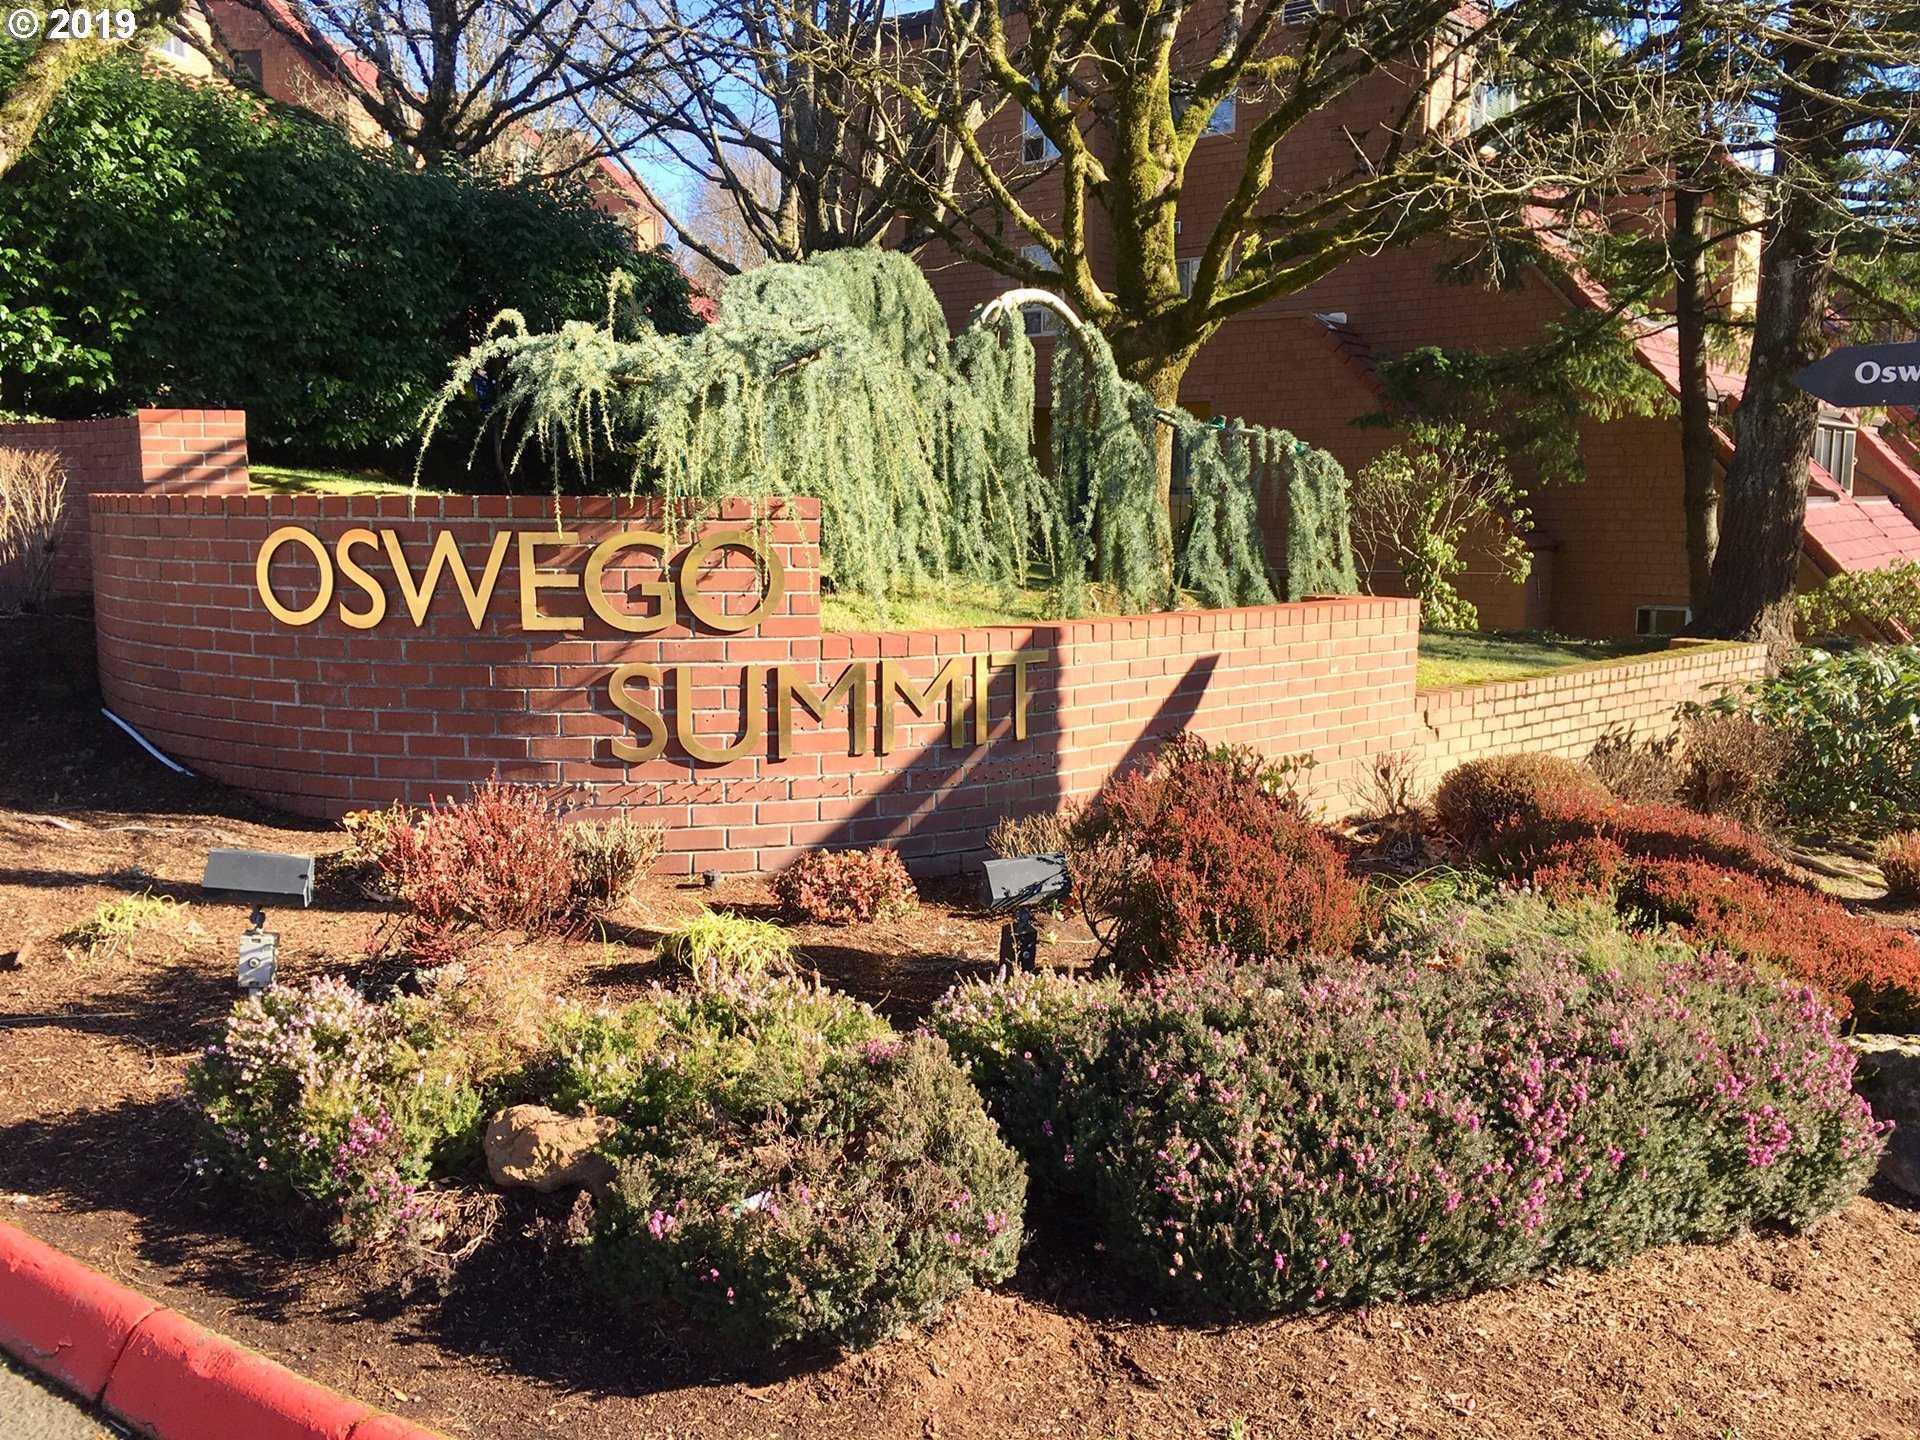 $179,900 - 1Br/1Ba -  for Sale in Oswego Summit, Lake Oswego